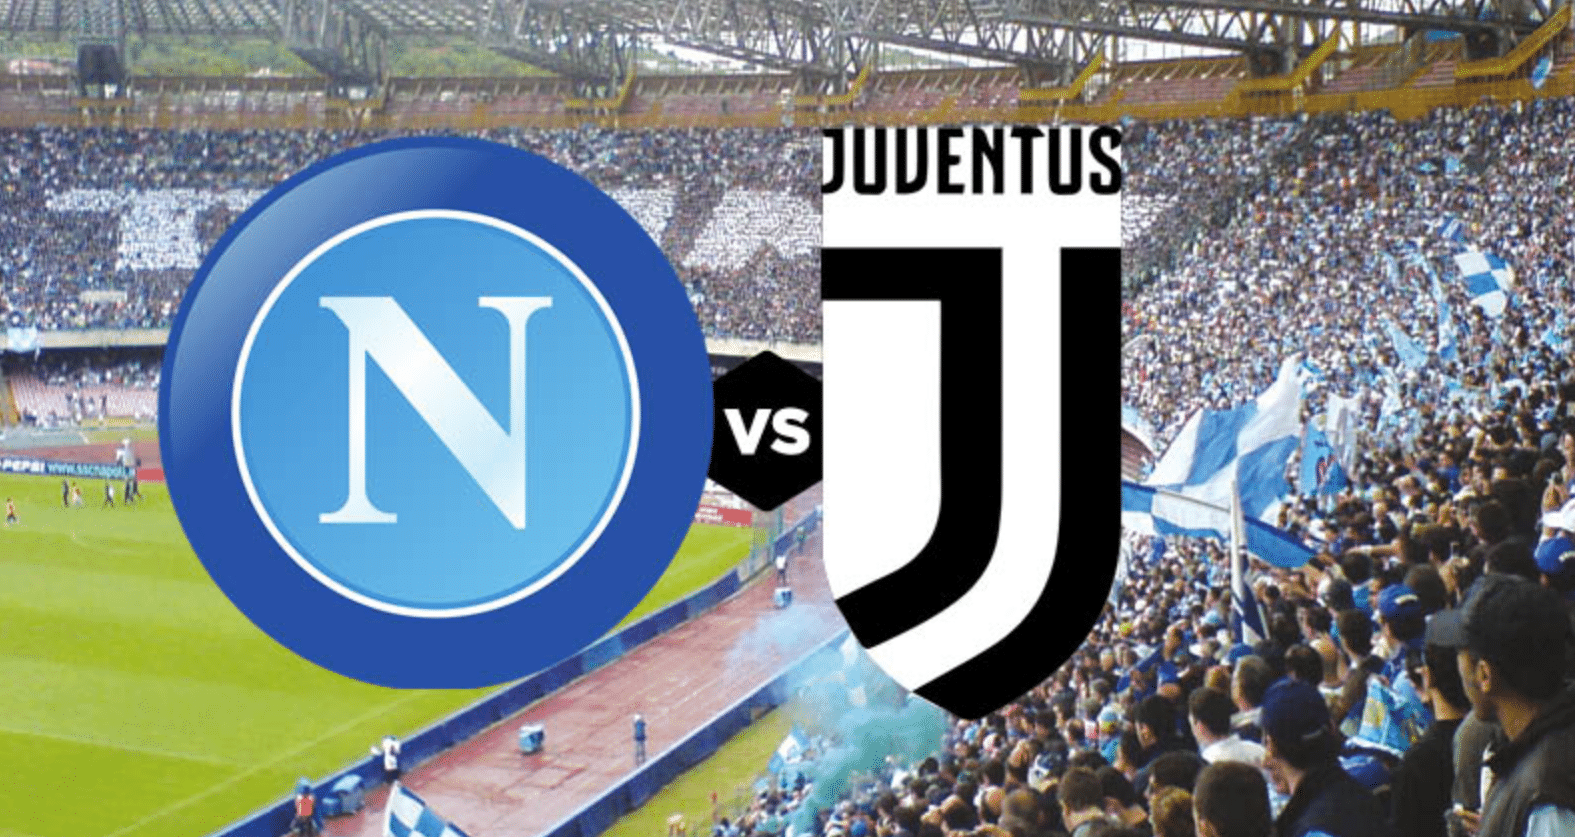 Napoli vs Juventus 01/26/19 – Serie A League Odds, Preview & Prediction